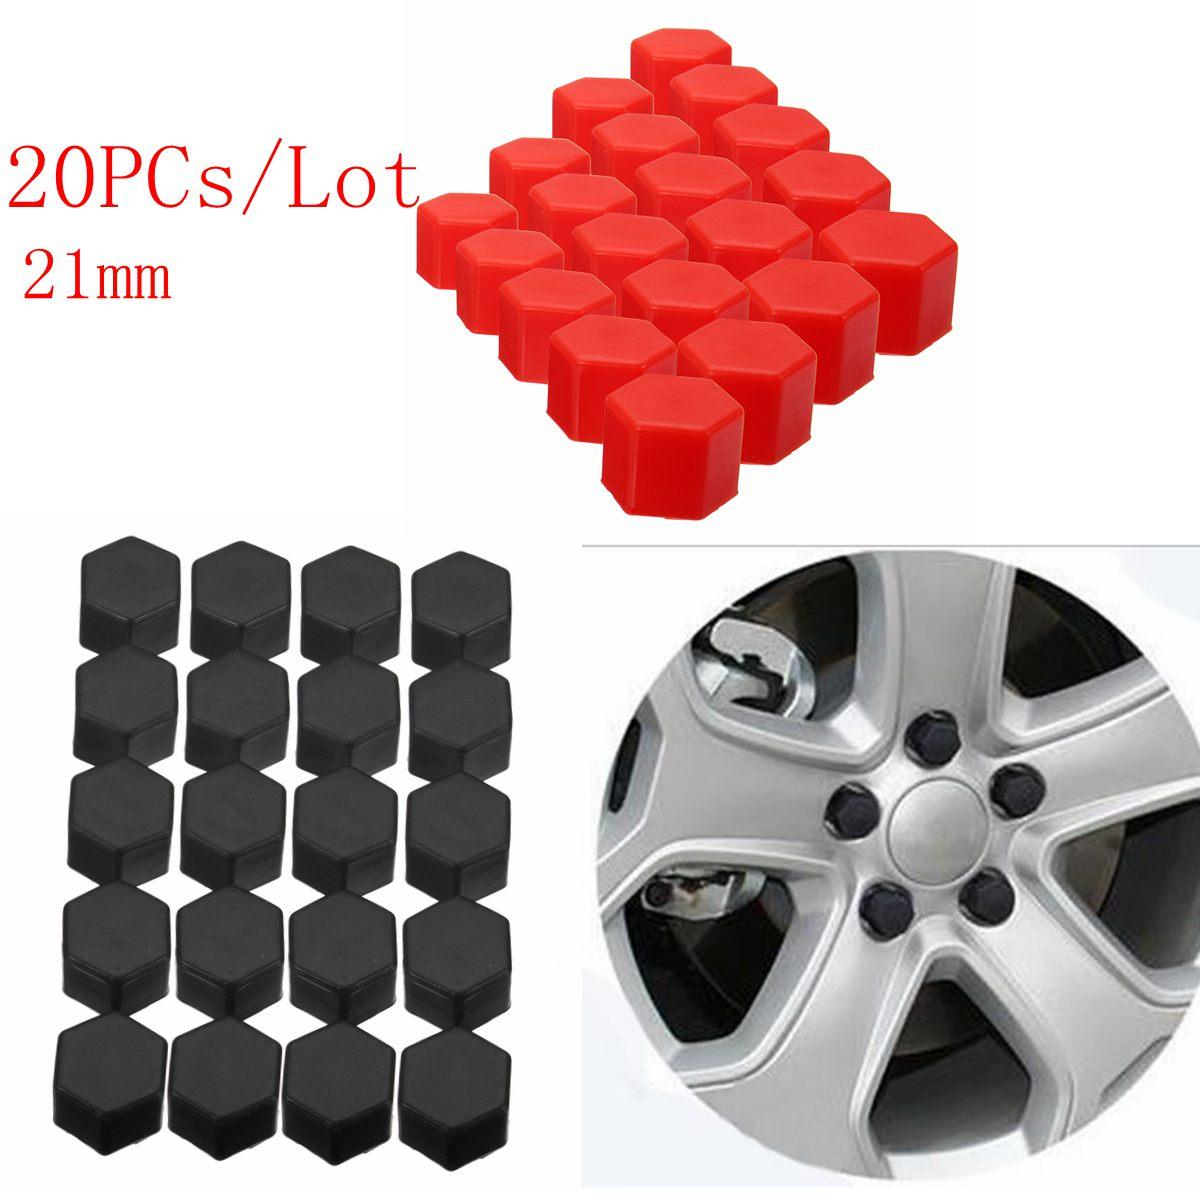 20pcs Auto Car Wheel Nut Bolt Tire Screw Cover Cap 17mm ABS Plastic Universal